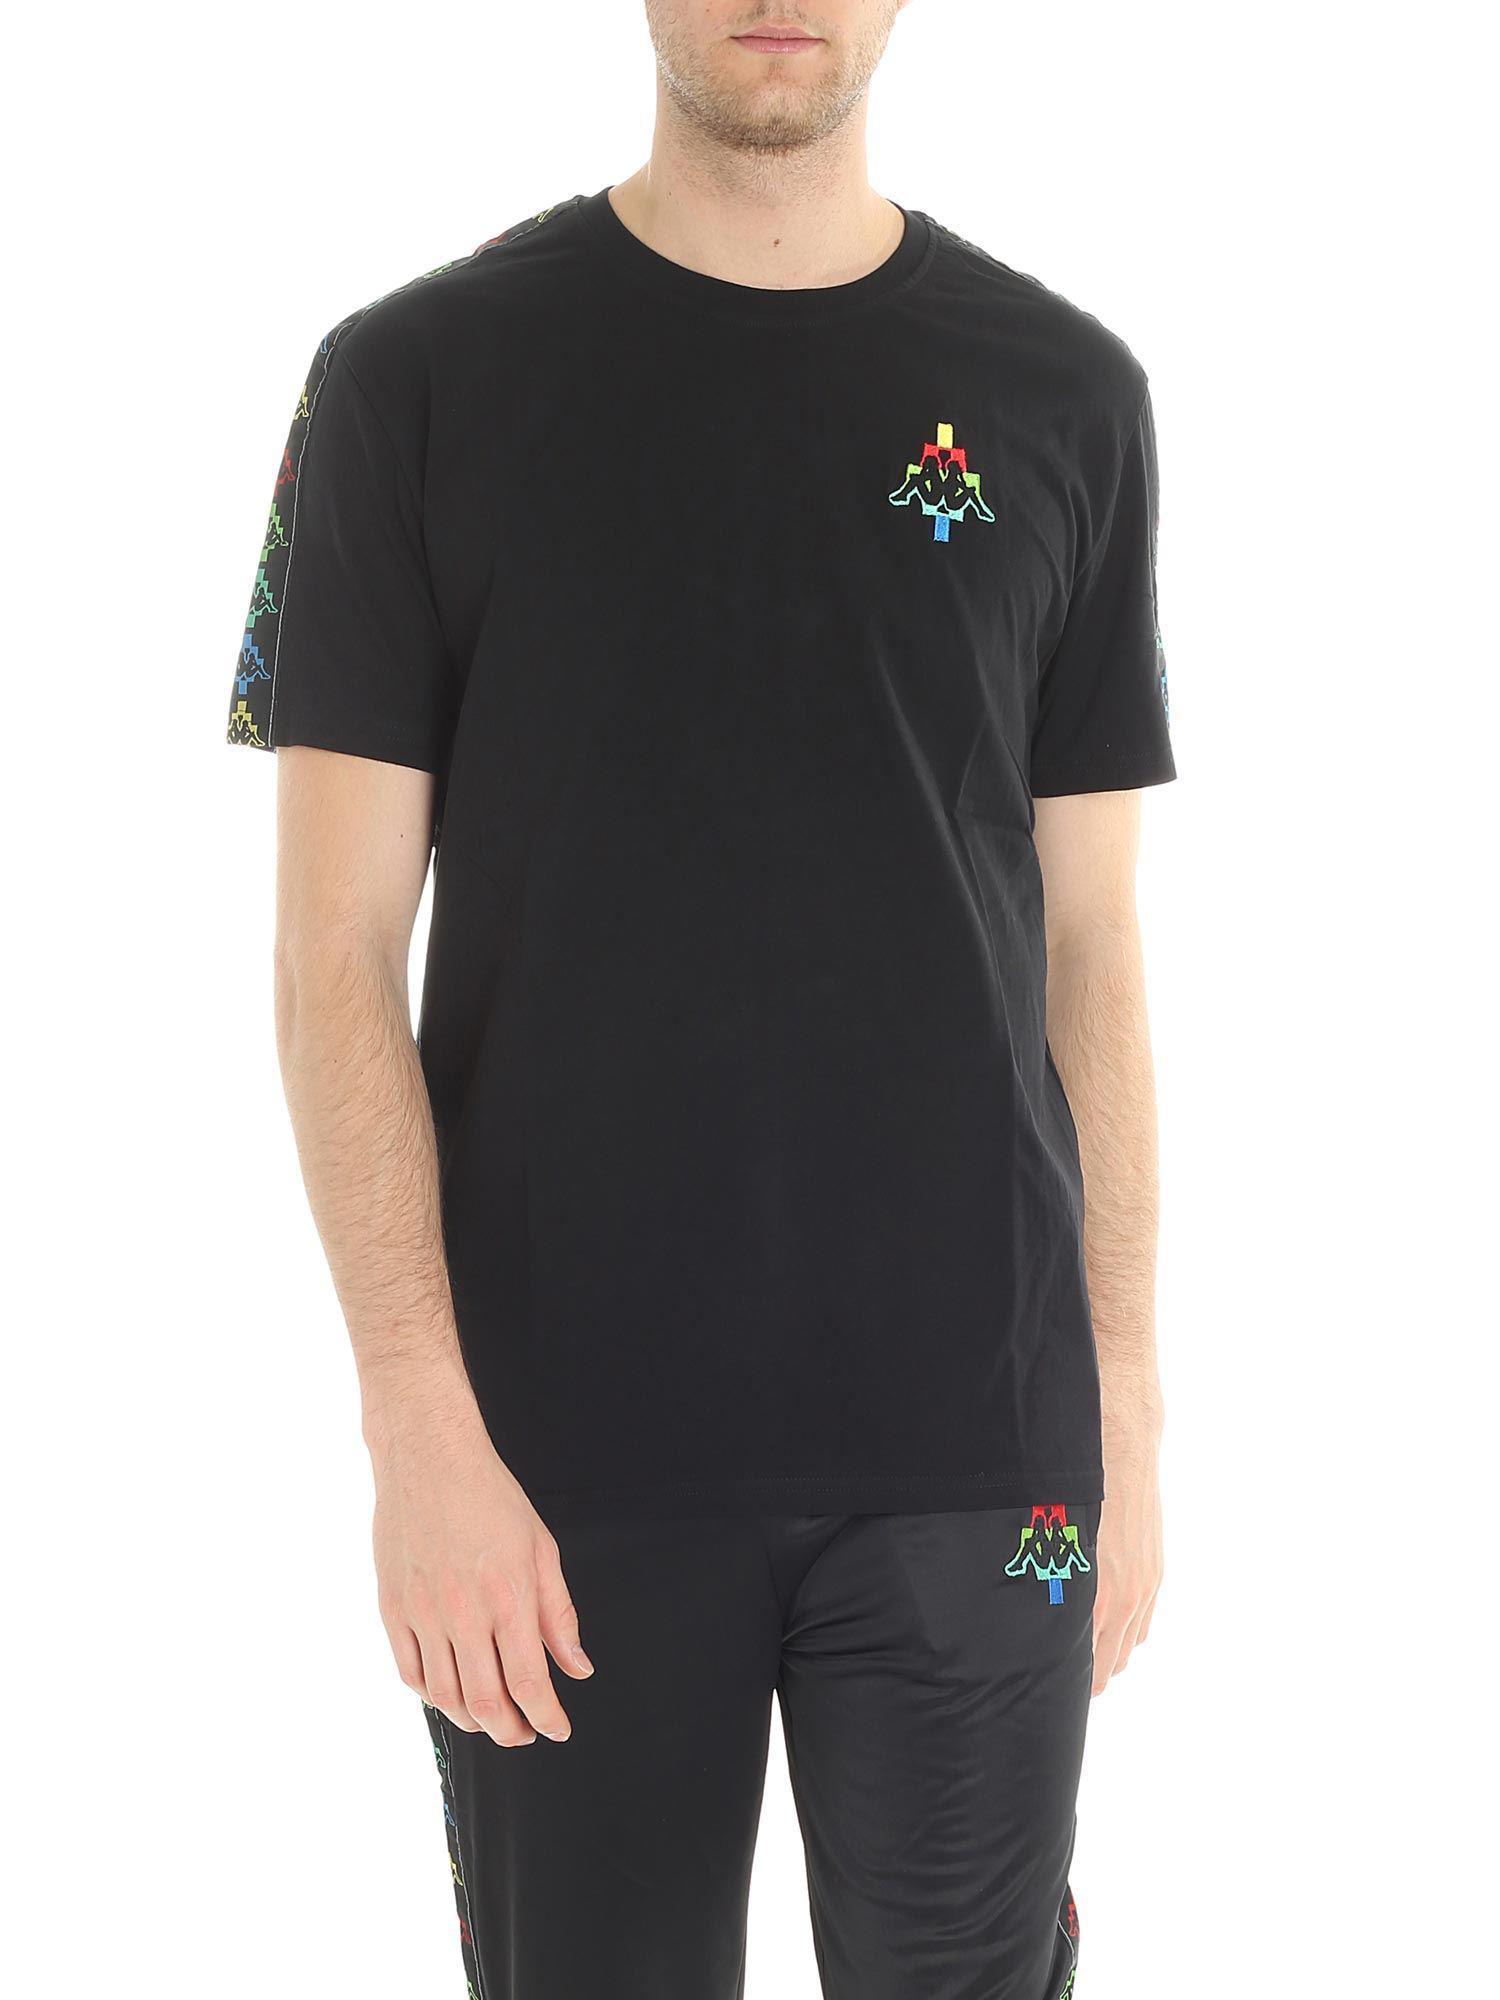 3e4f0cbacd18 Lyst - Marcelo Burlon Black Kappa T-shirt in Black for Men